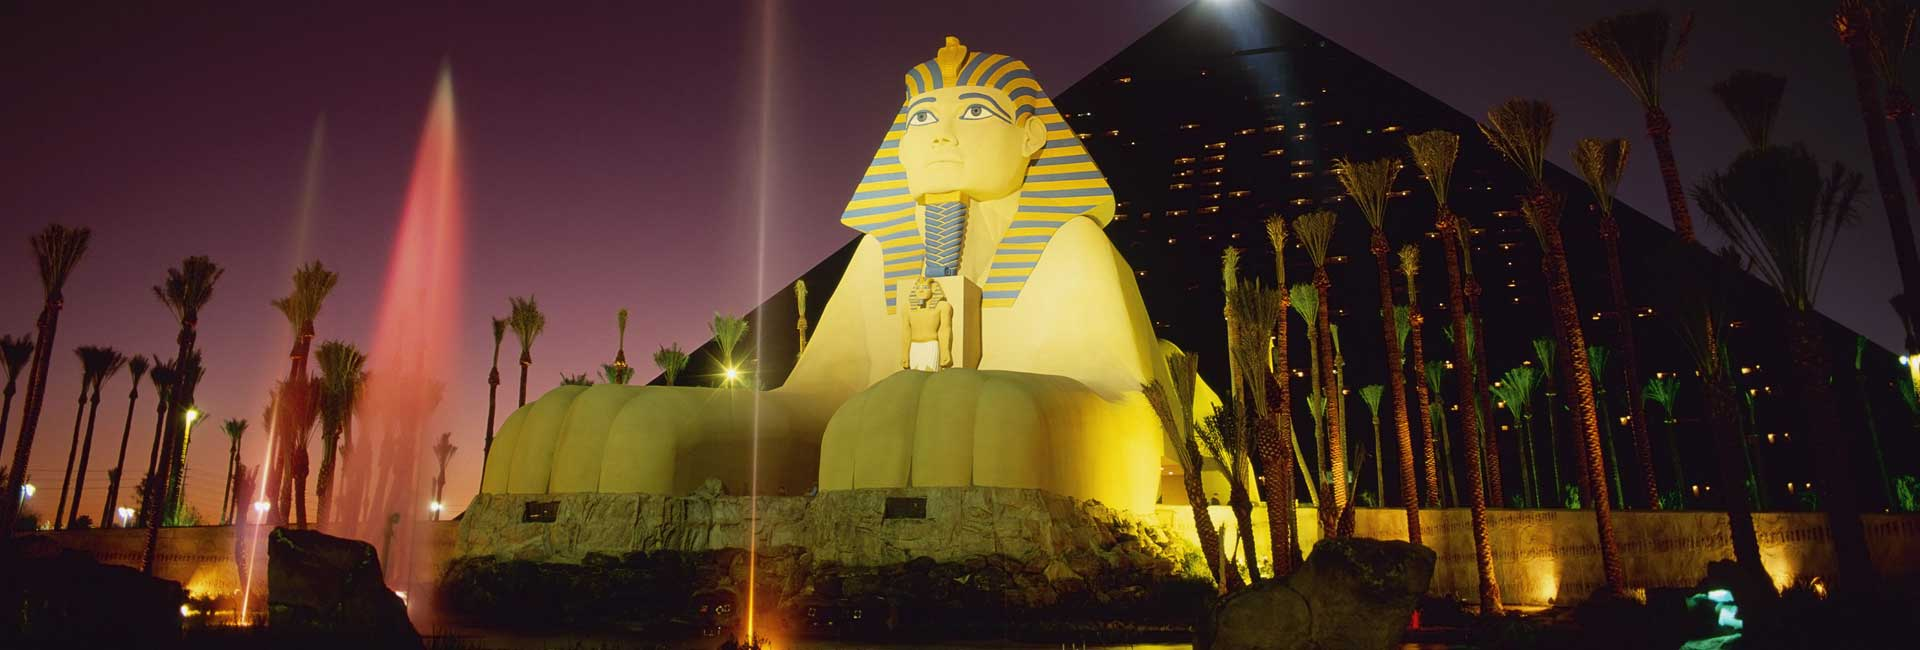 Luxor Top Attractions